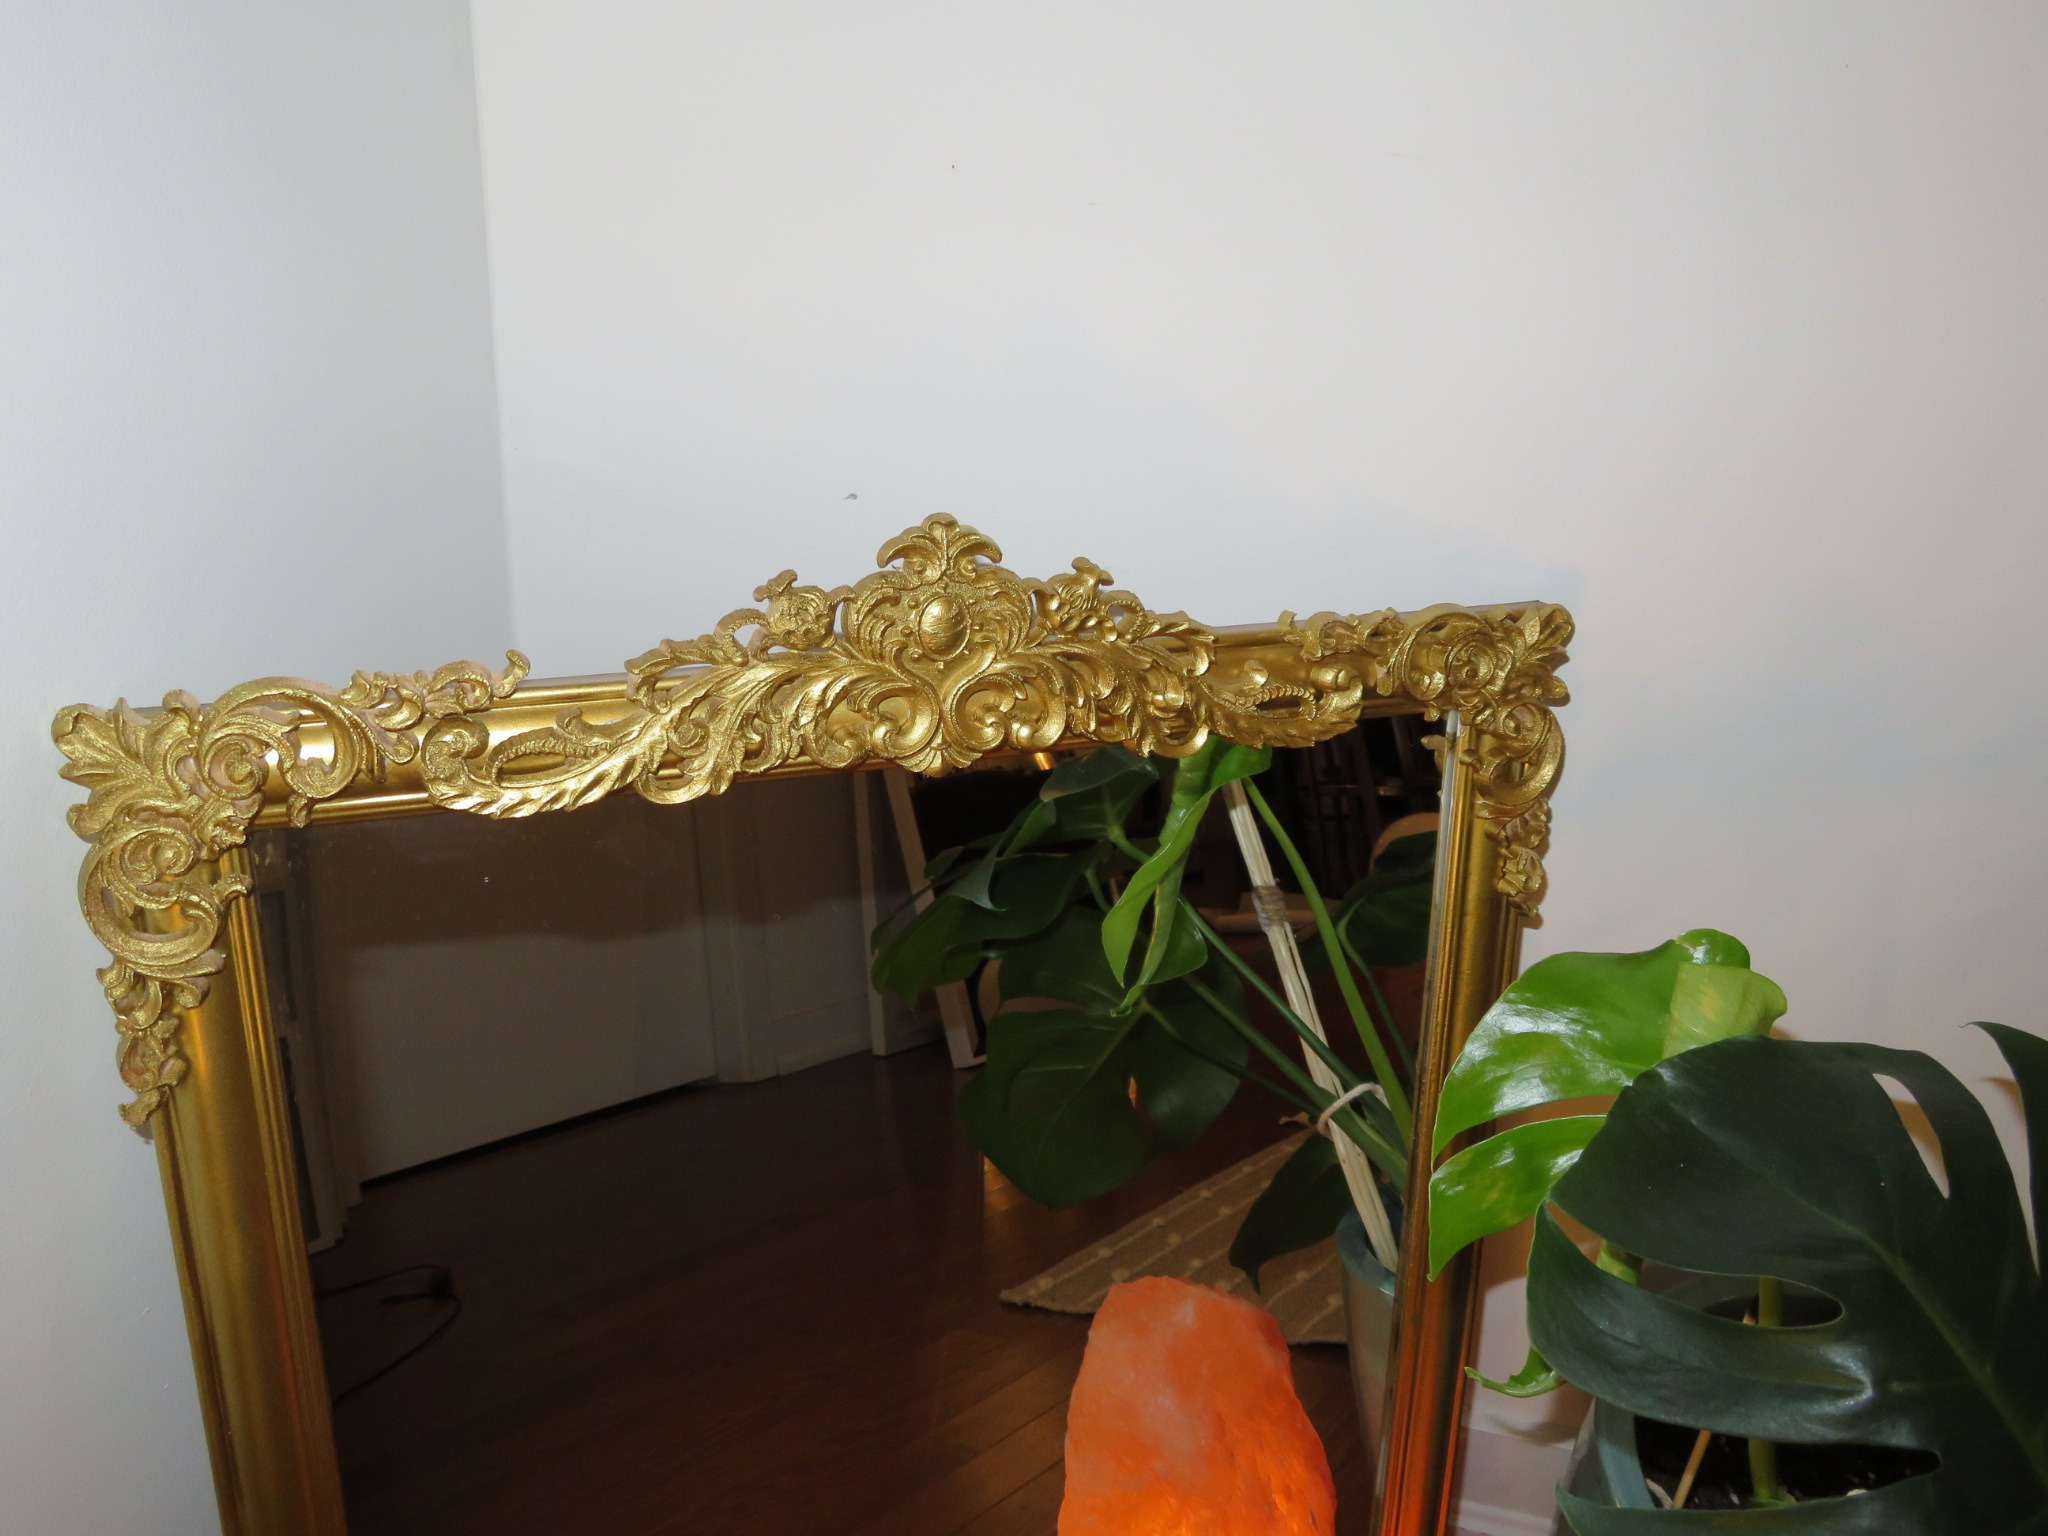 DIY Faux Brass Vintage Inspired Mirror